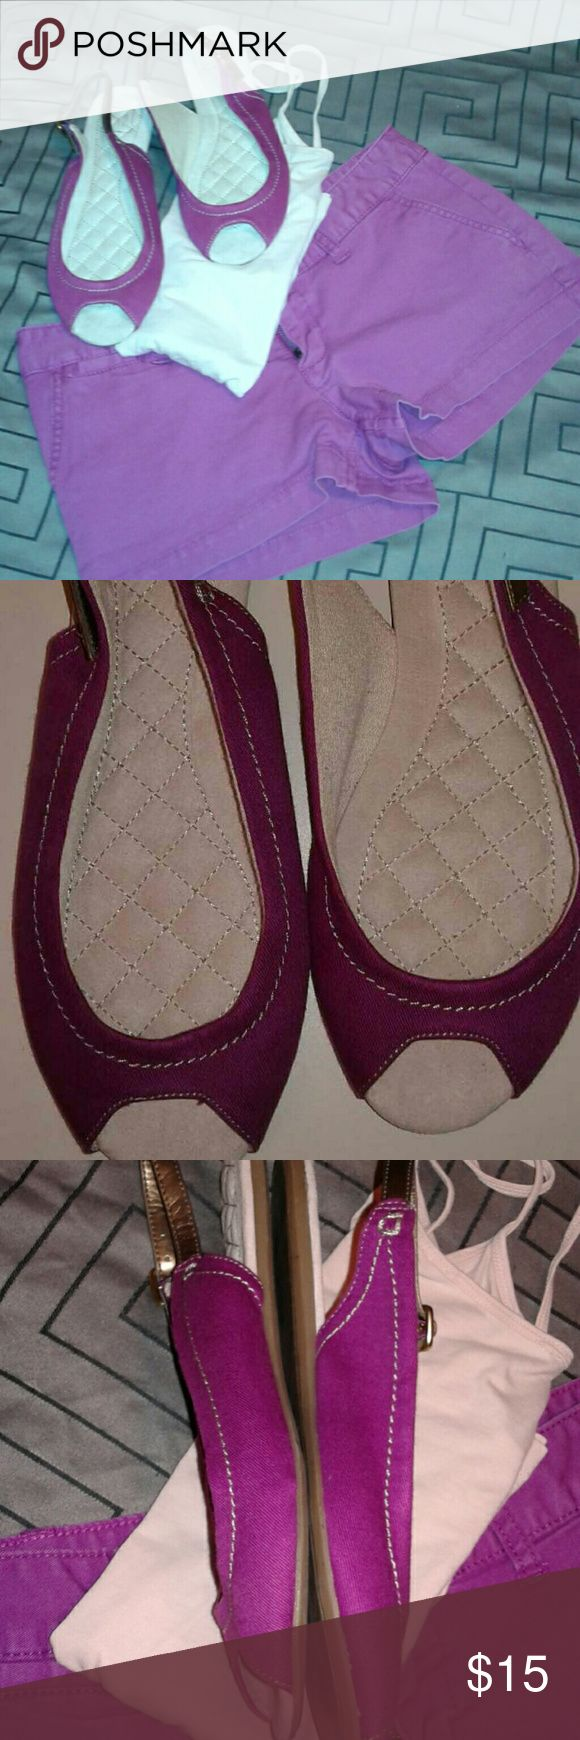 Peep toe purple Gap sandals size 7 Like new size 7 purple with Gold Hardware Gap peep toe sandal GAP Shoes Sandals